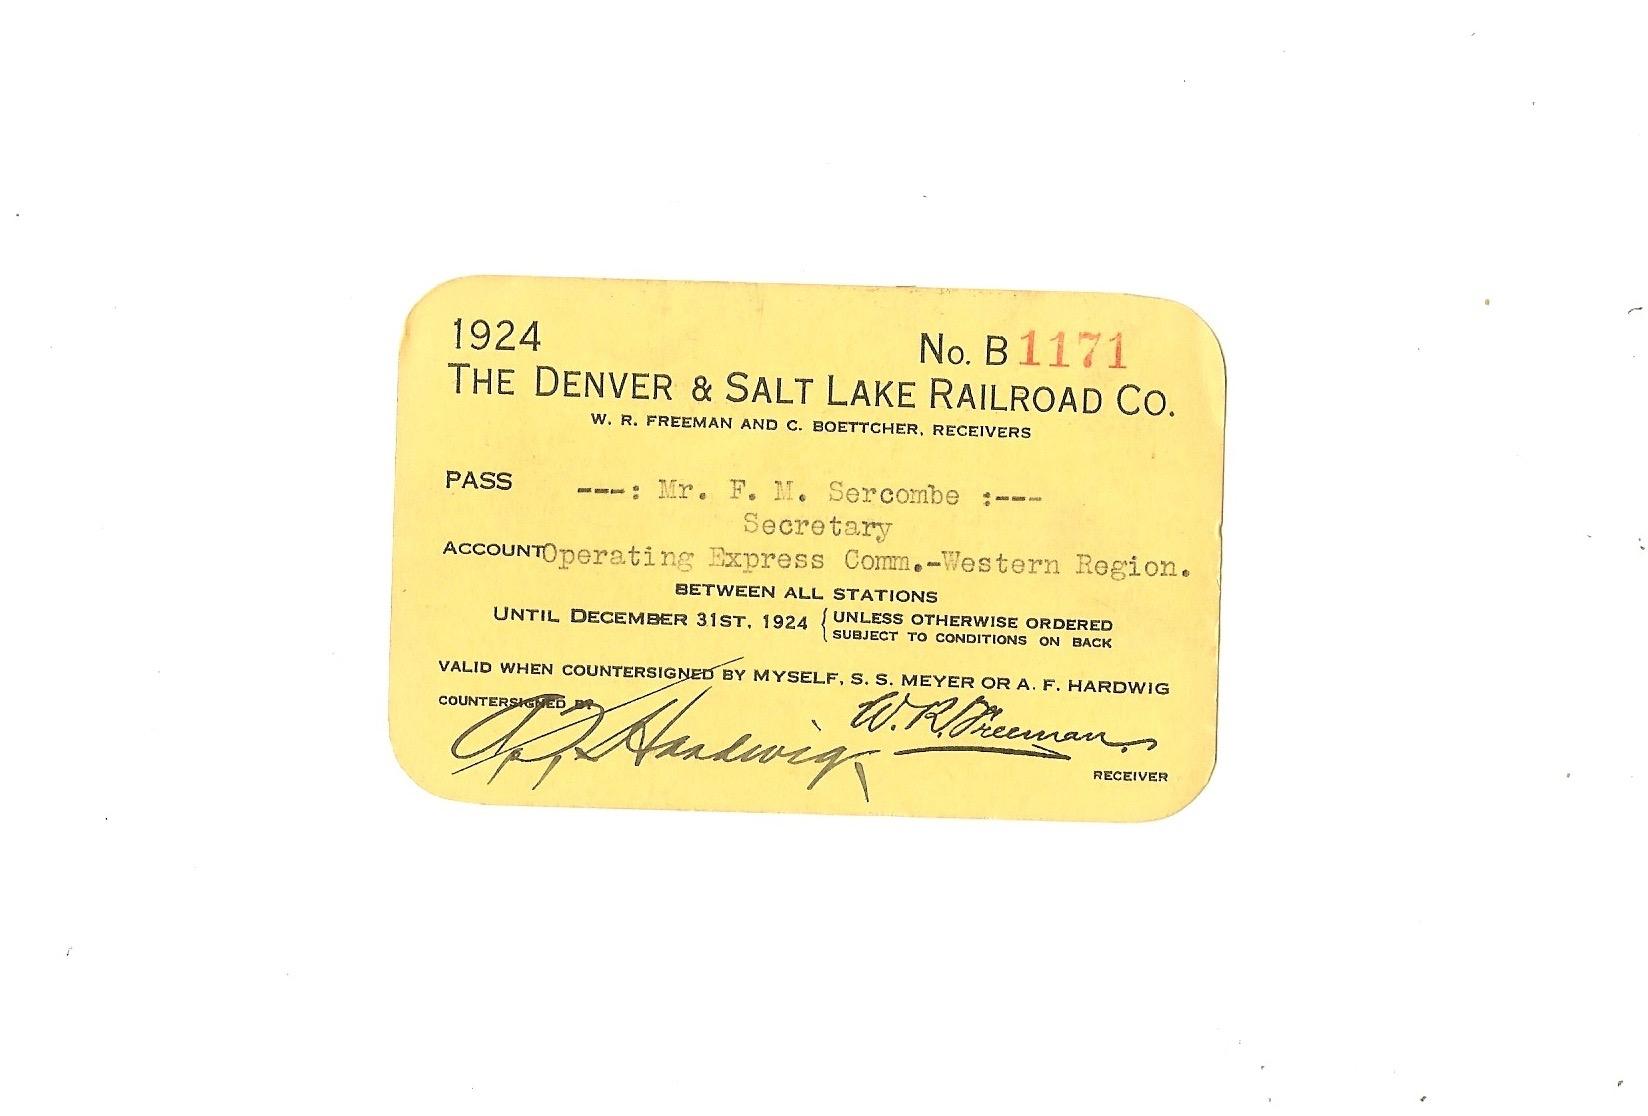 The Denver & Salt Lake Railroad Company Pass 1924